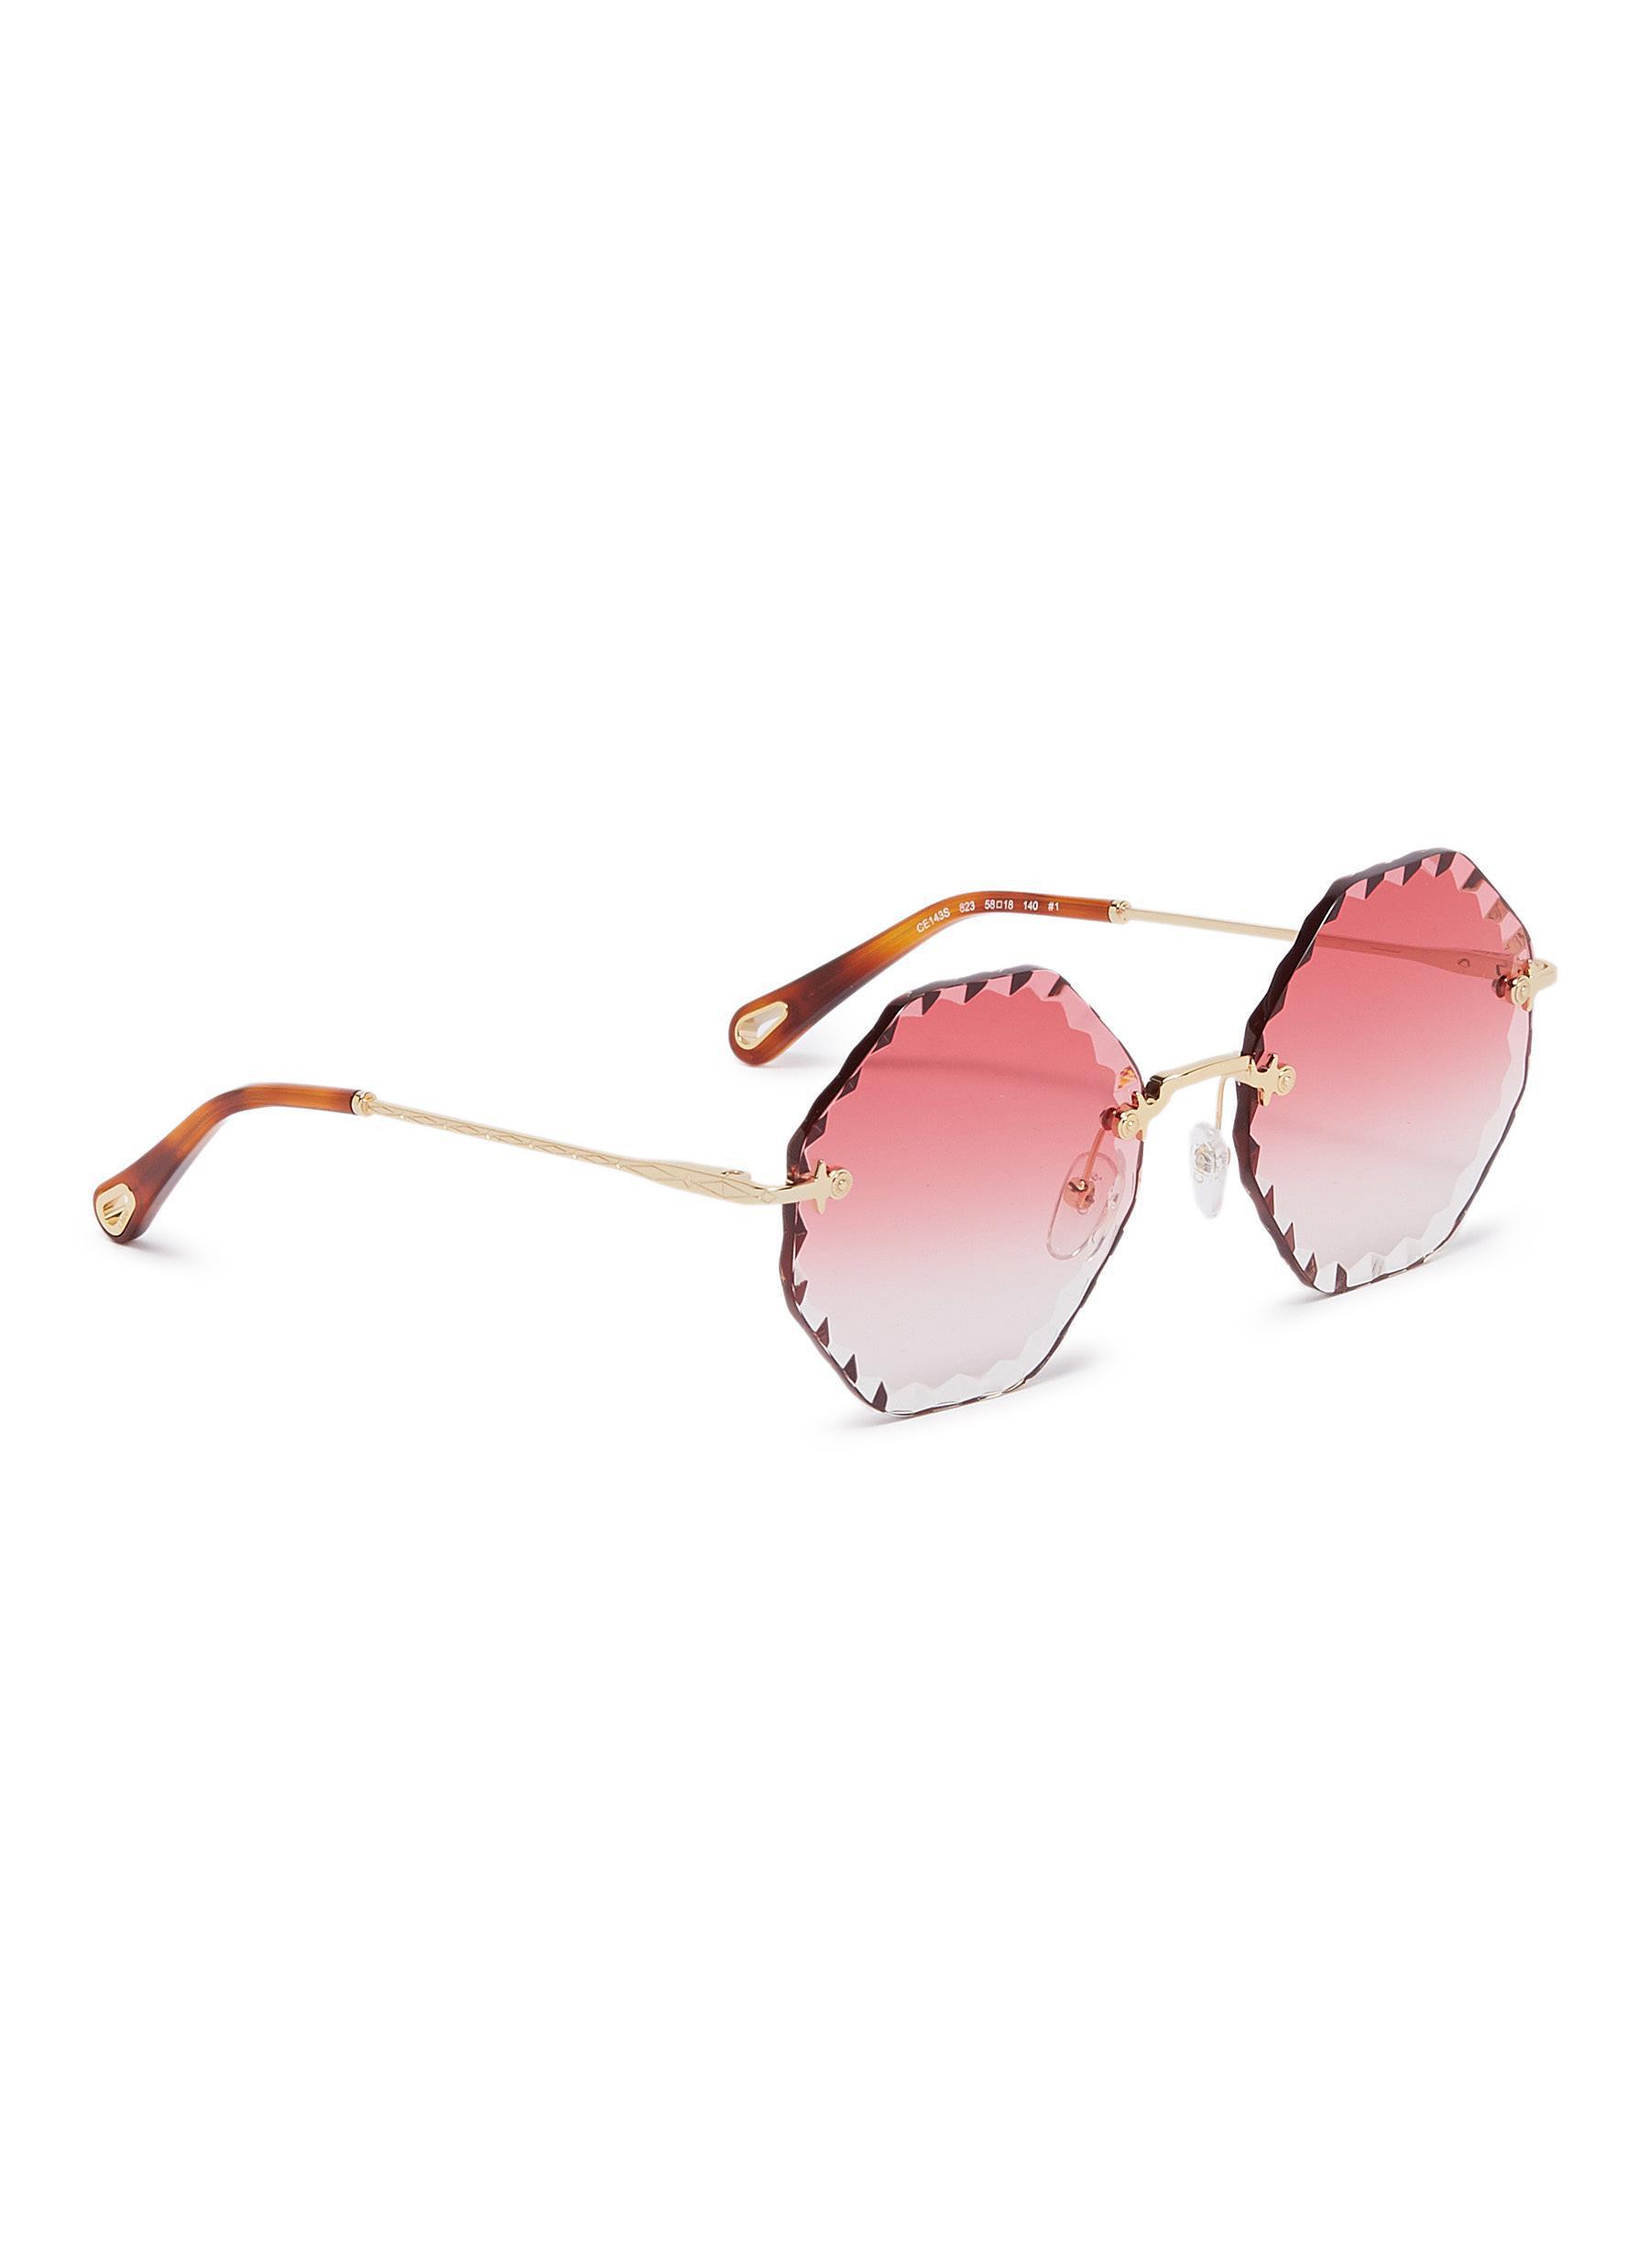 2c868c748d15 Lyst - Chloé 'rosie' Rimless Sunburst Octagon Frame Sunglasses in ...